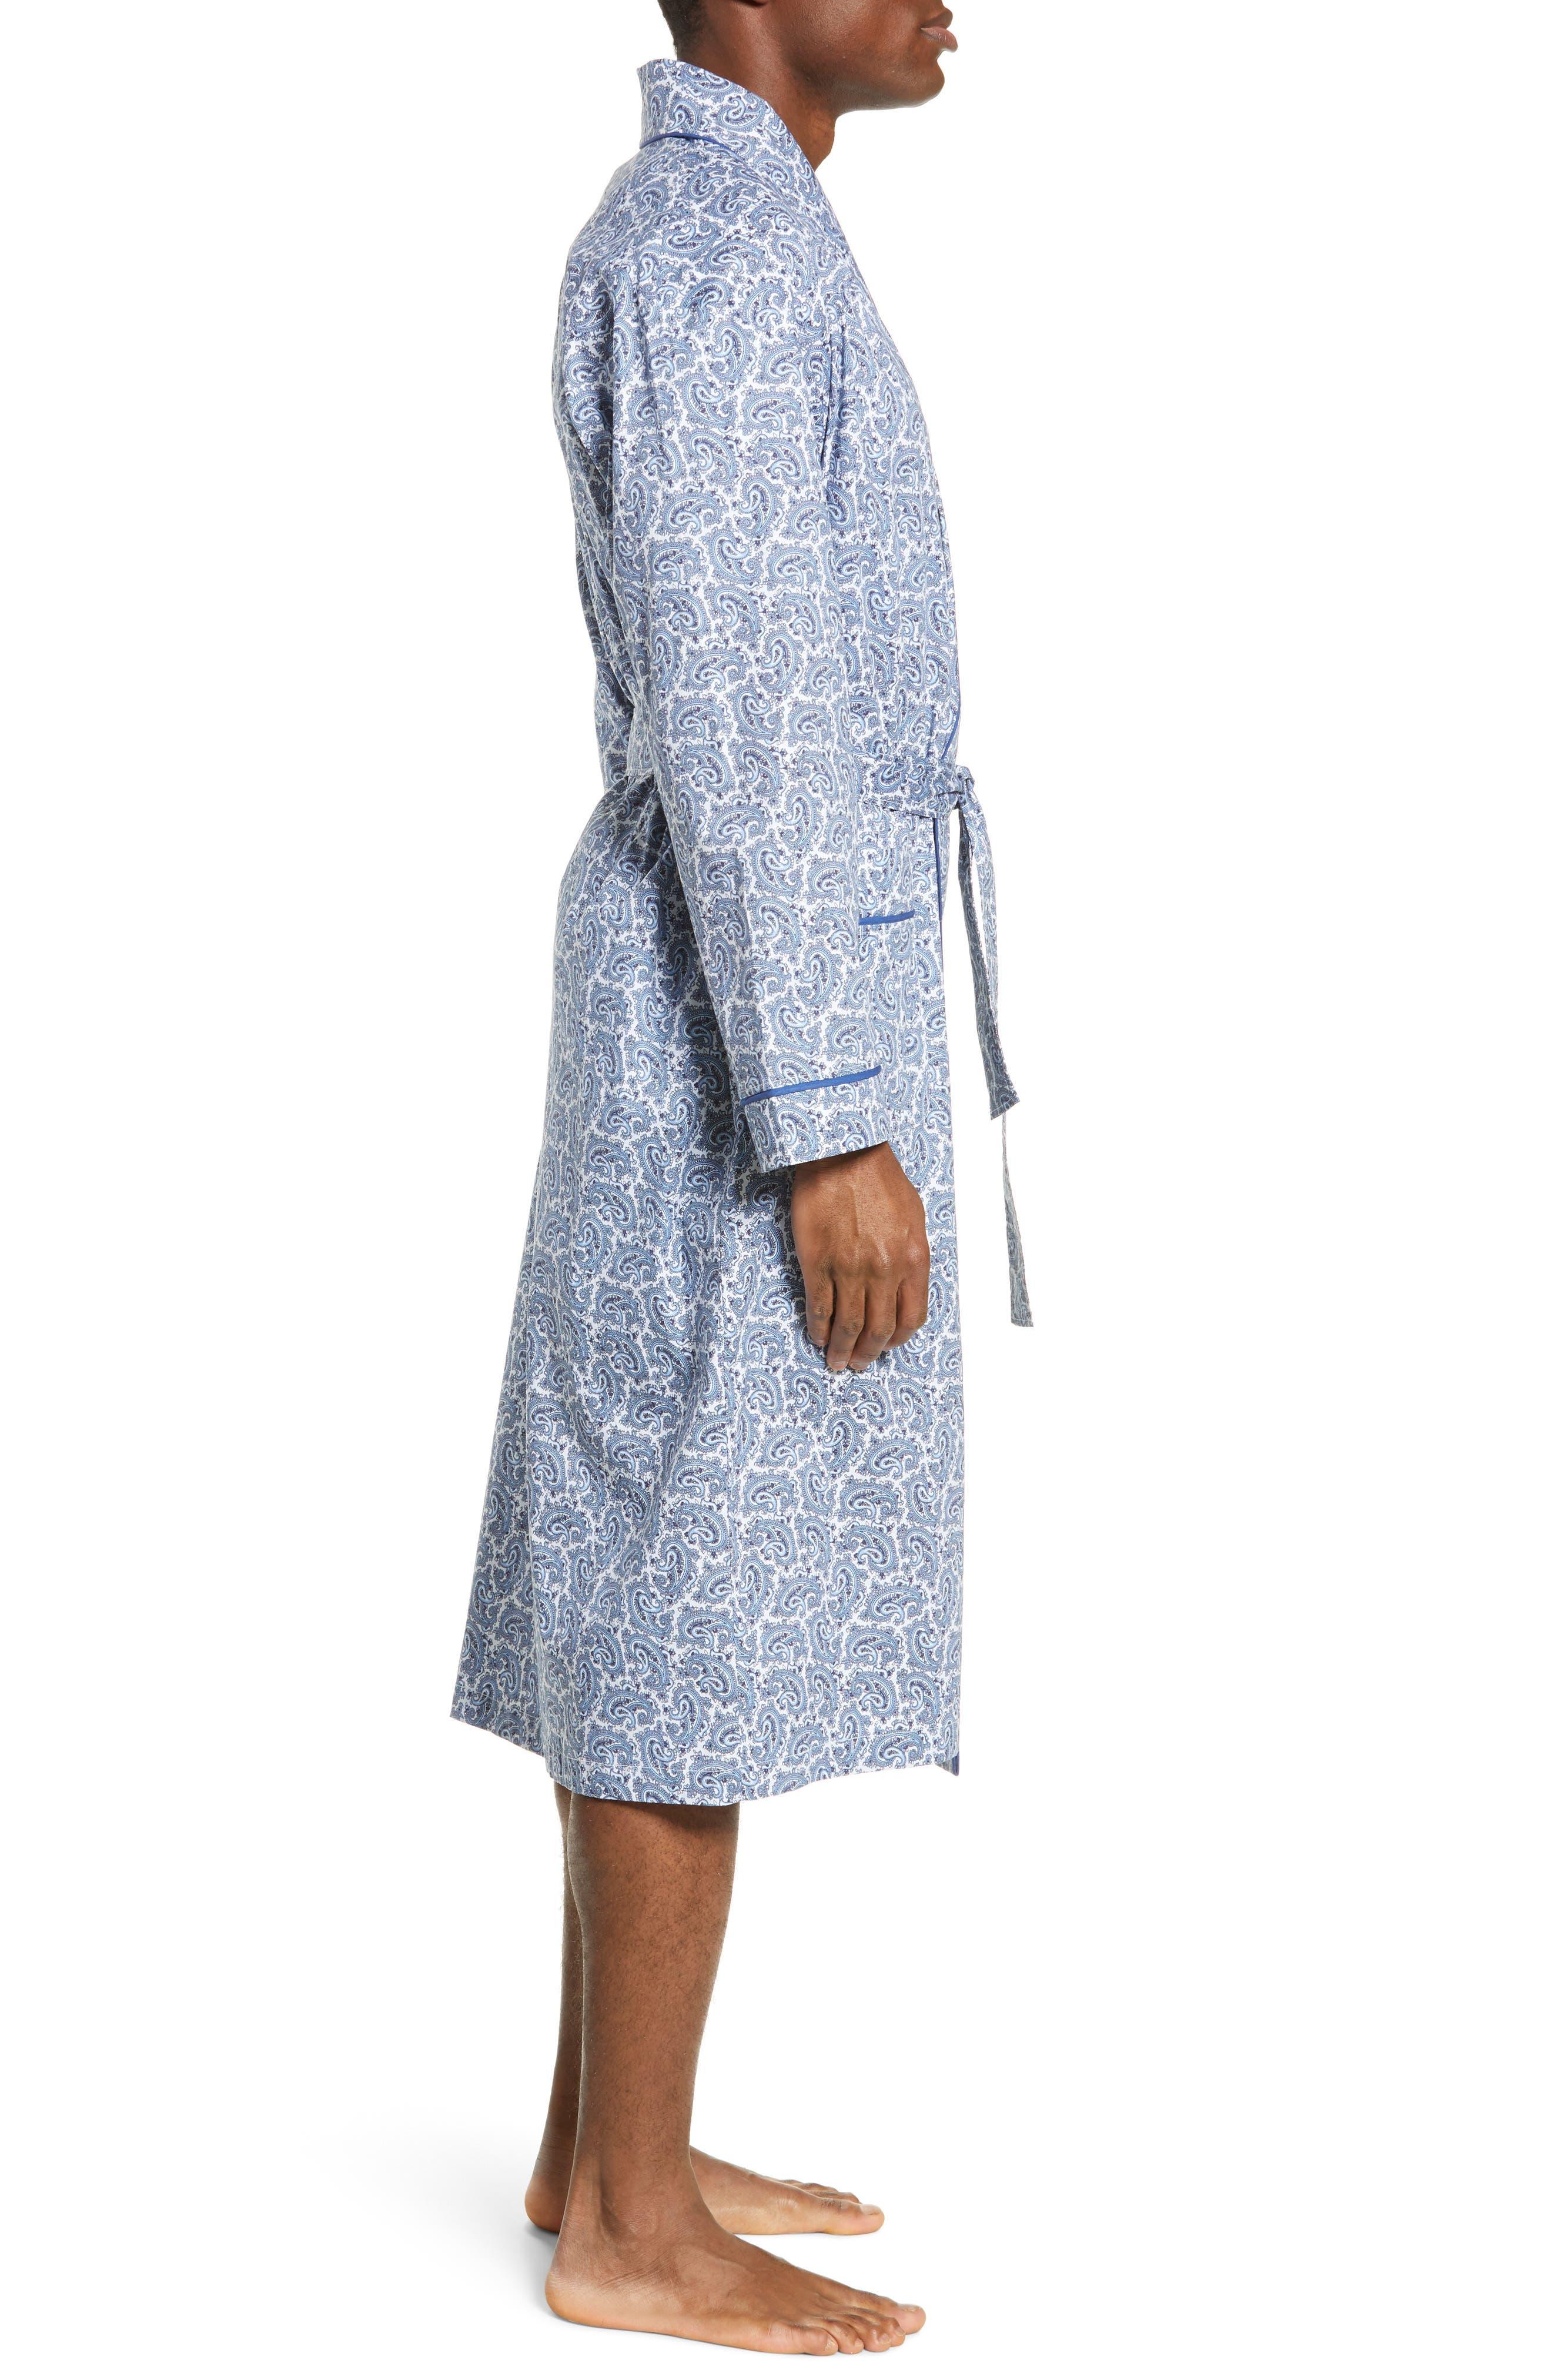 MAJESTIC INTERNATIONAL, Marbella Stretch Sateen Robe, Alternate thumbnail 3, color, POOL